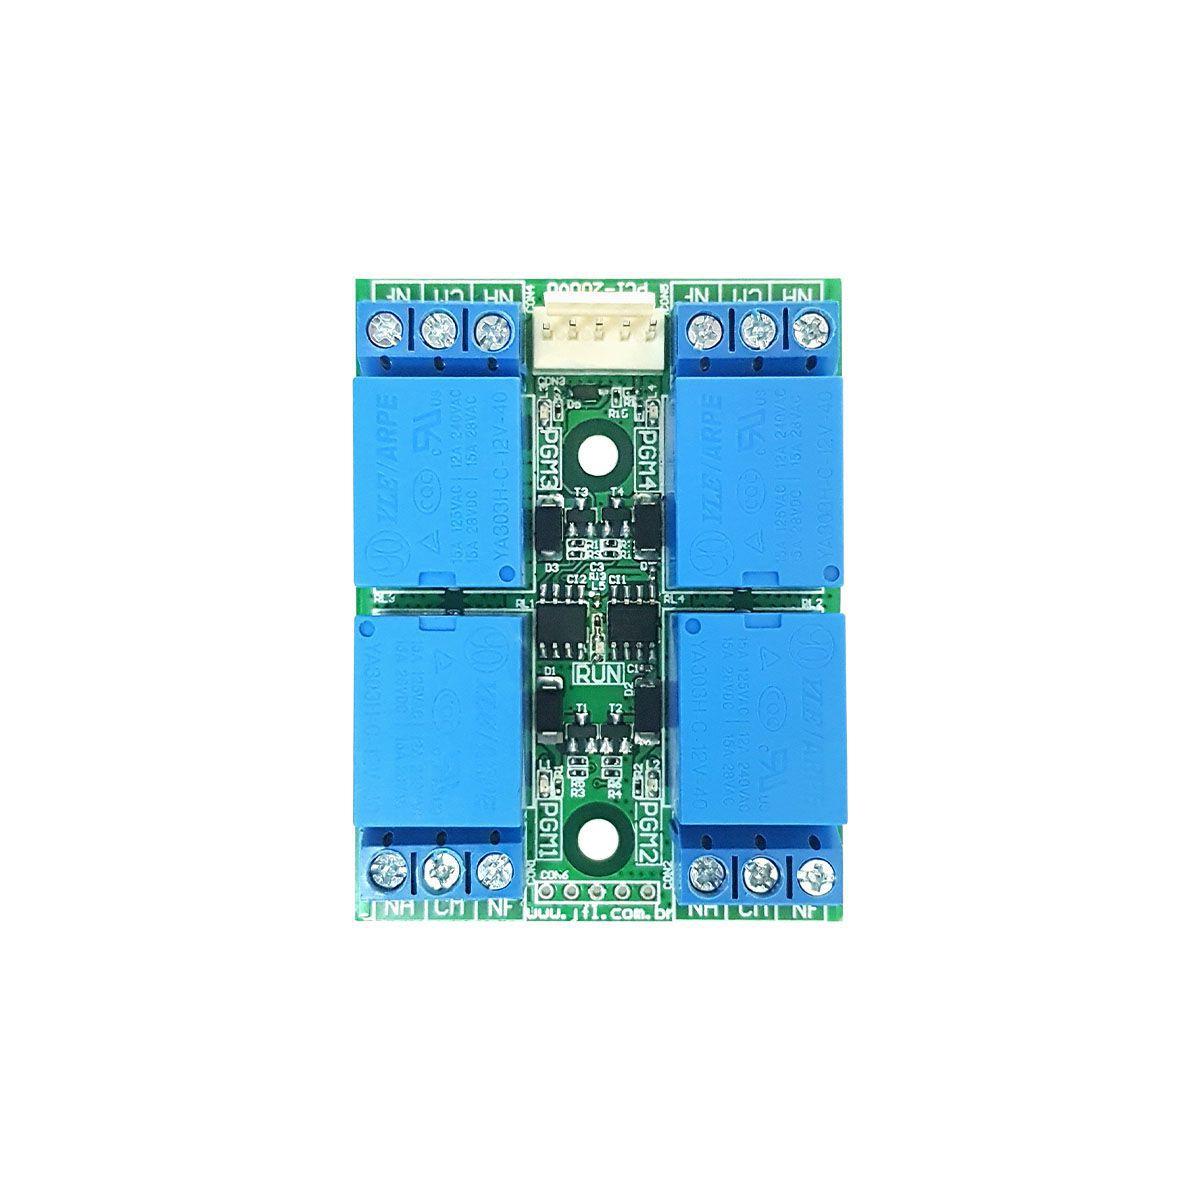 Kit Acessorios Jfl Pgm Ethernet Programador